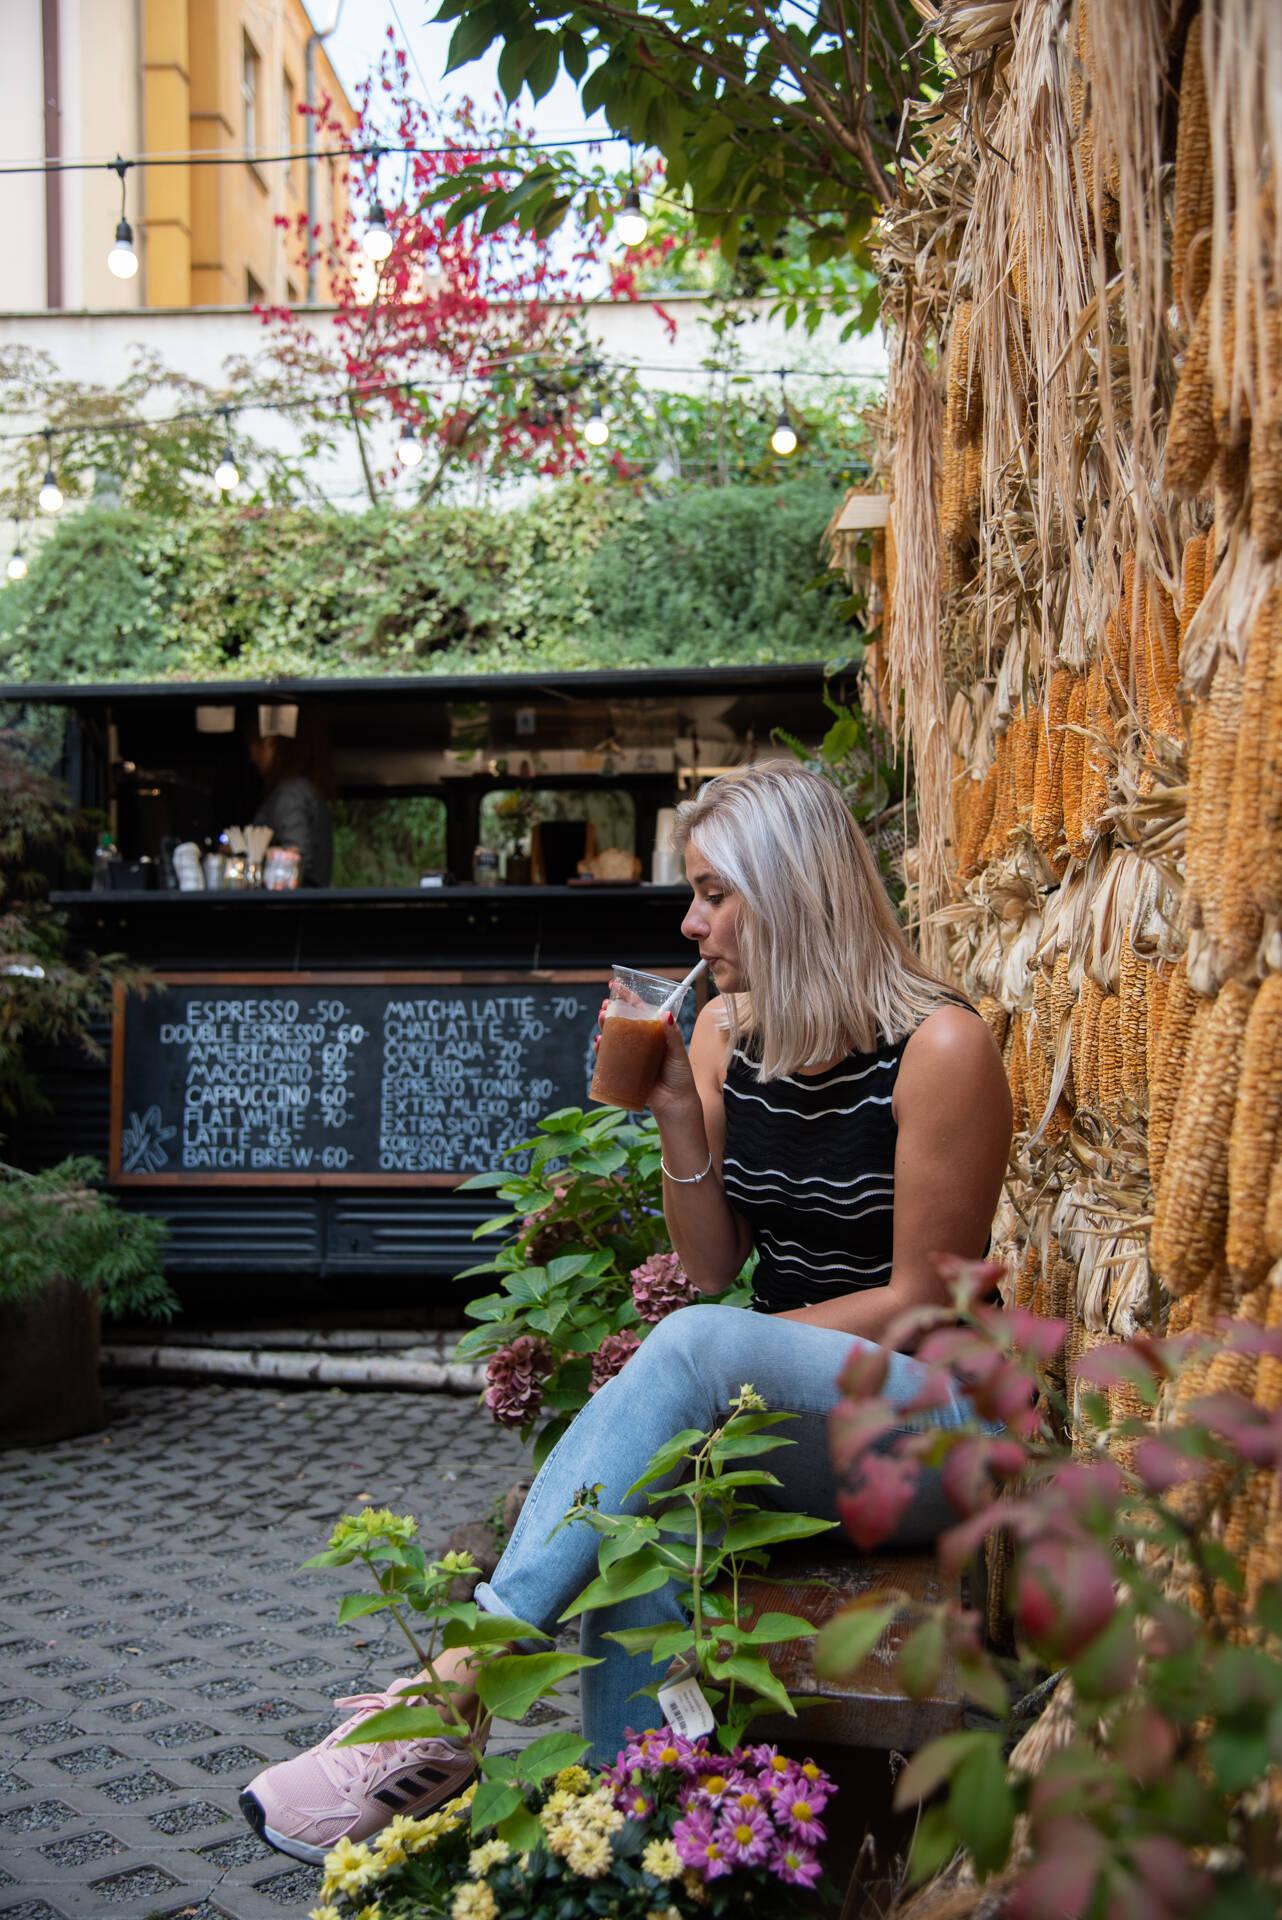 Botanica Coffee Truck in Praag